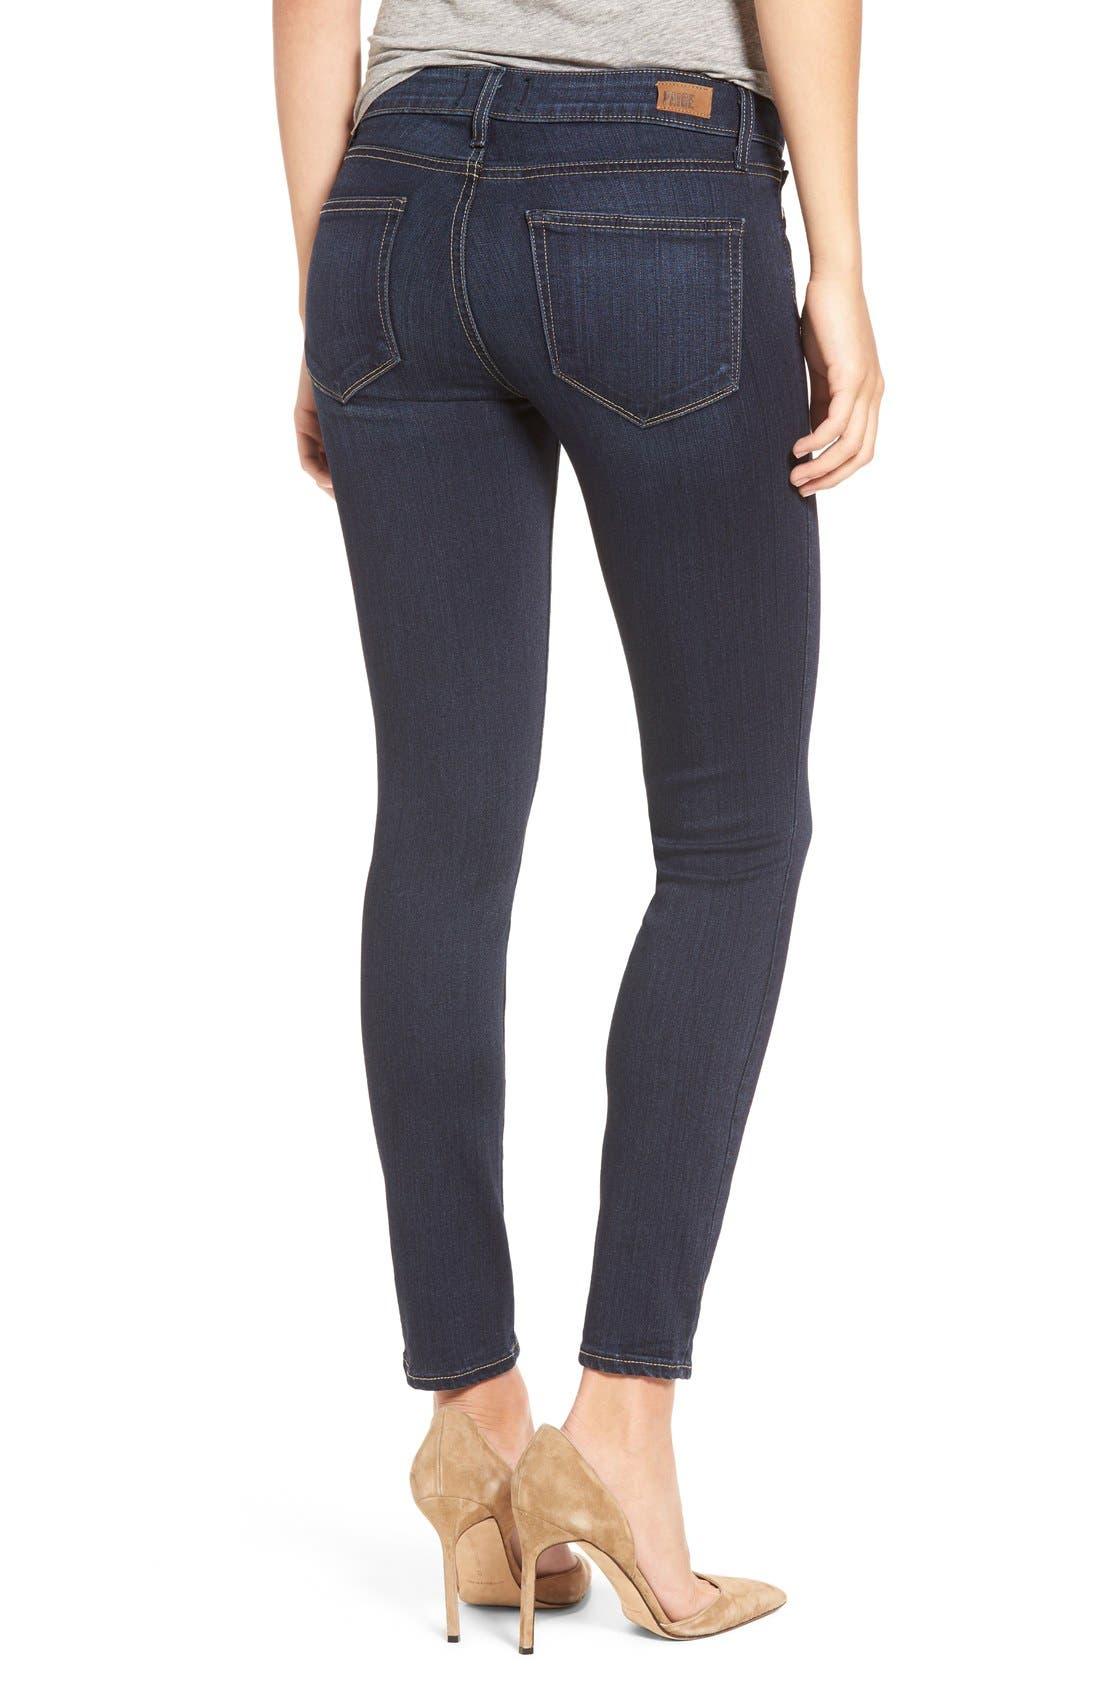 Alternate Image 3  - PAIGE 'Transcend - Verdugo' Ankle Ultra Skinny Jeans (Hartmann) (Nordstrom Exclusive)